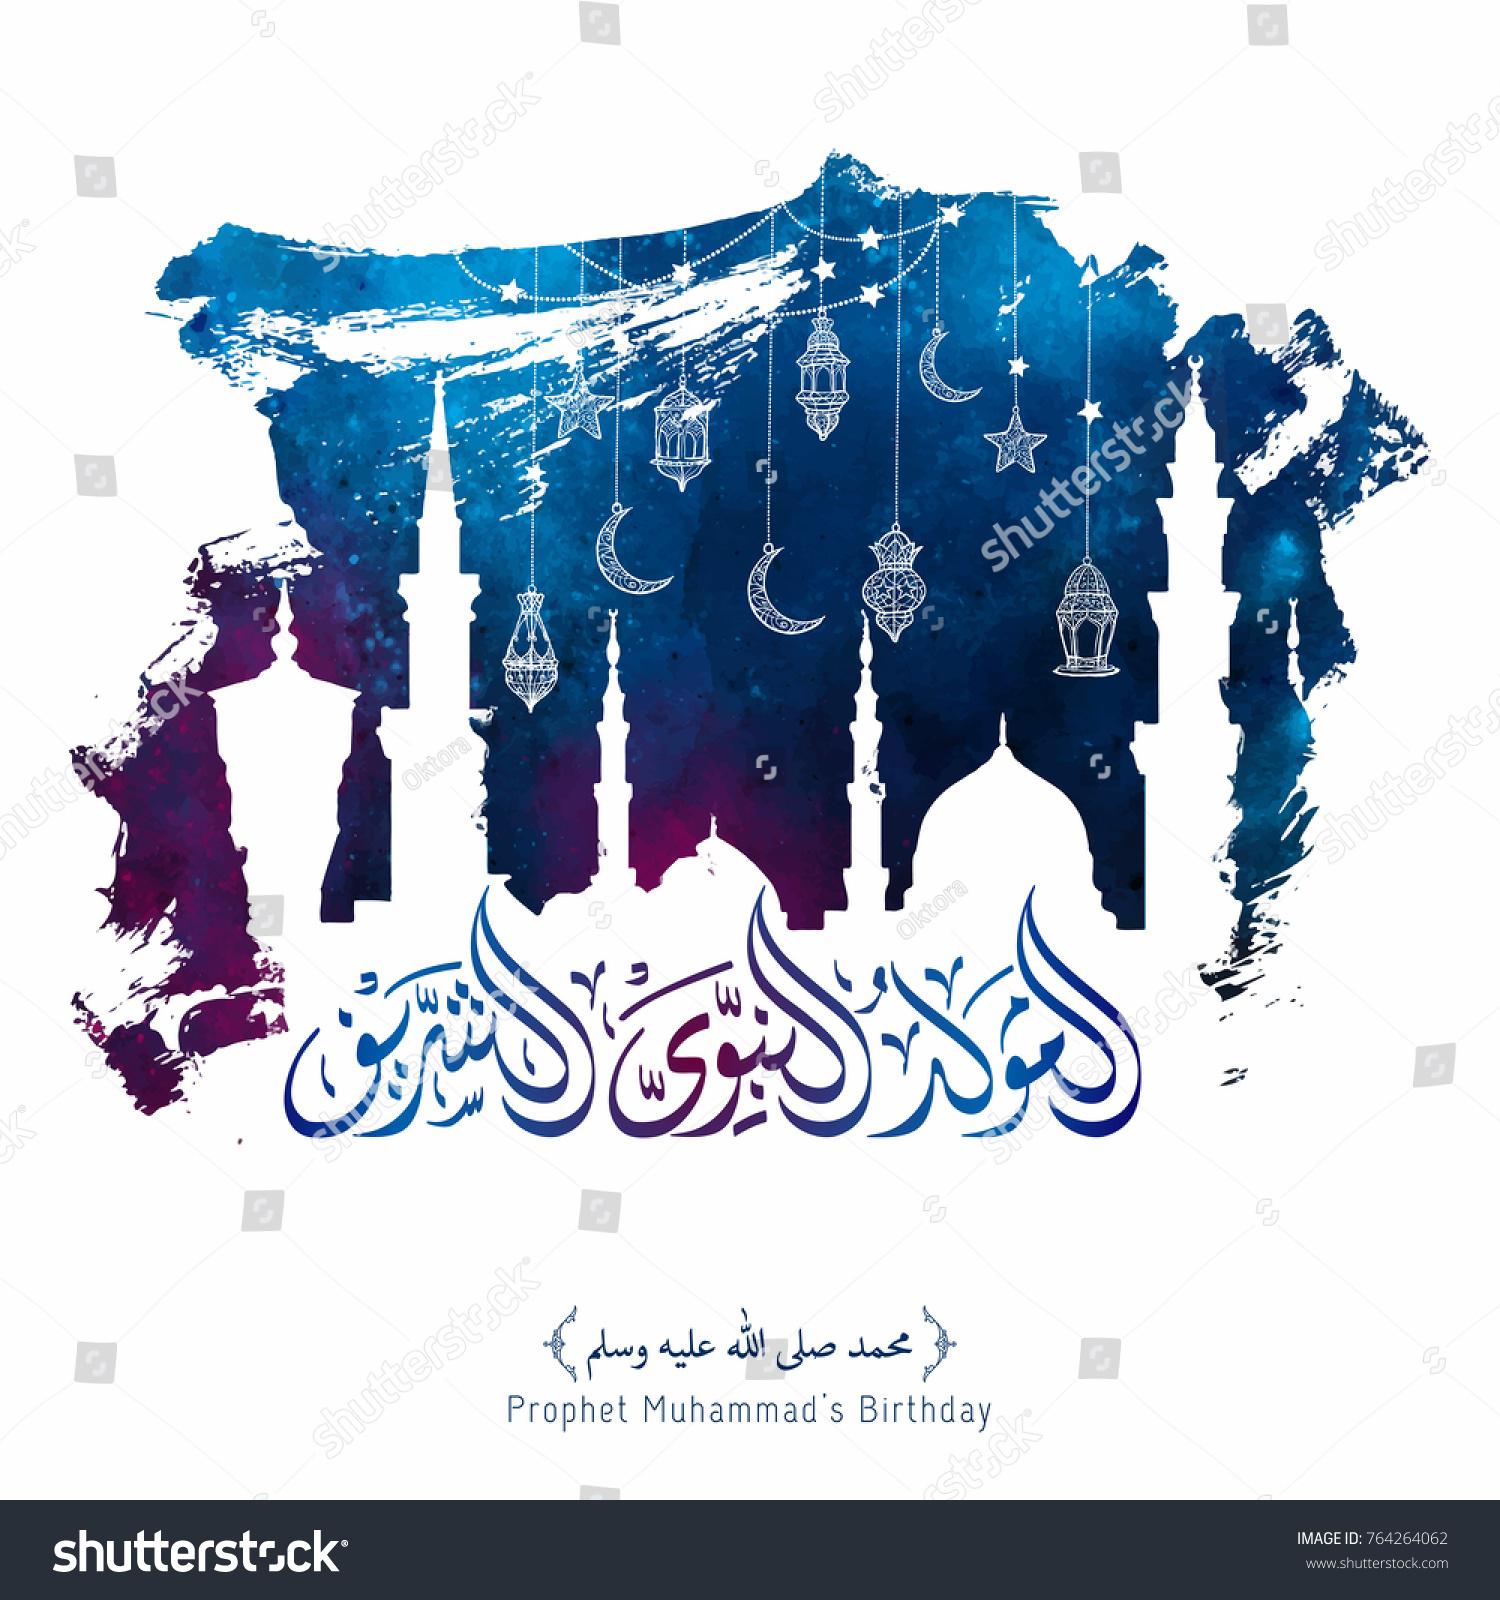 Mawlid al nabi islamic greeting banner stock photo photo vector mawlid al nabi islamic greeting banner bakground m4hsunfo Choice Image